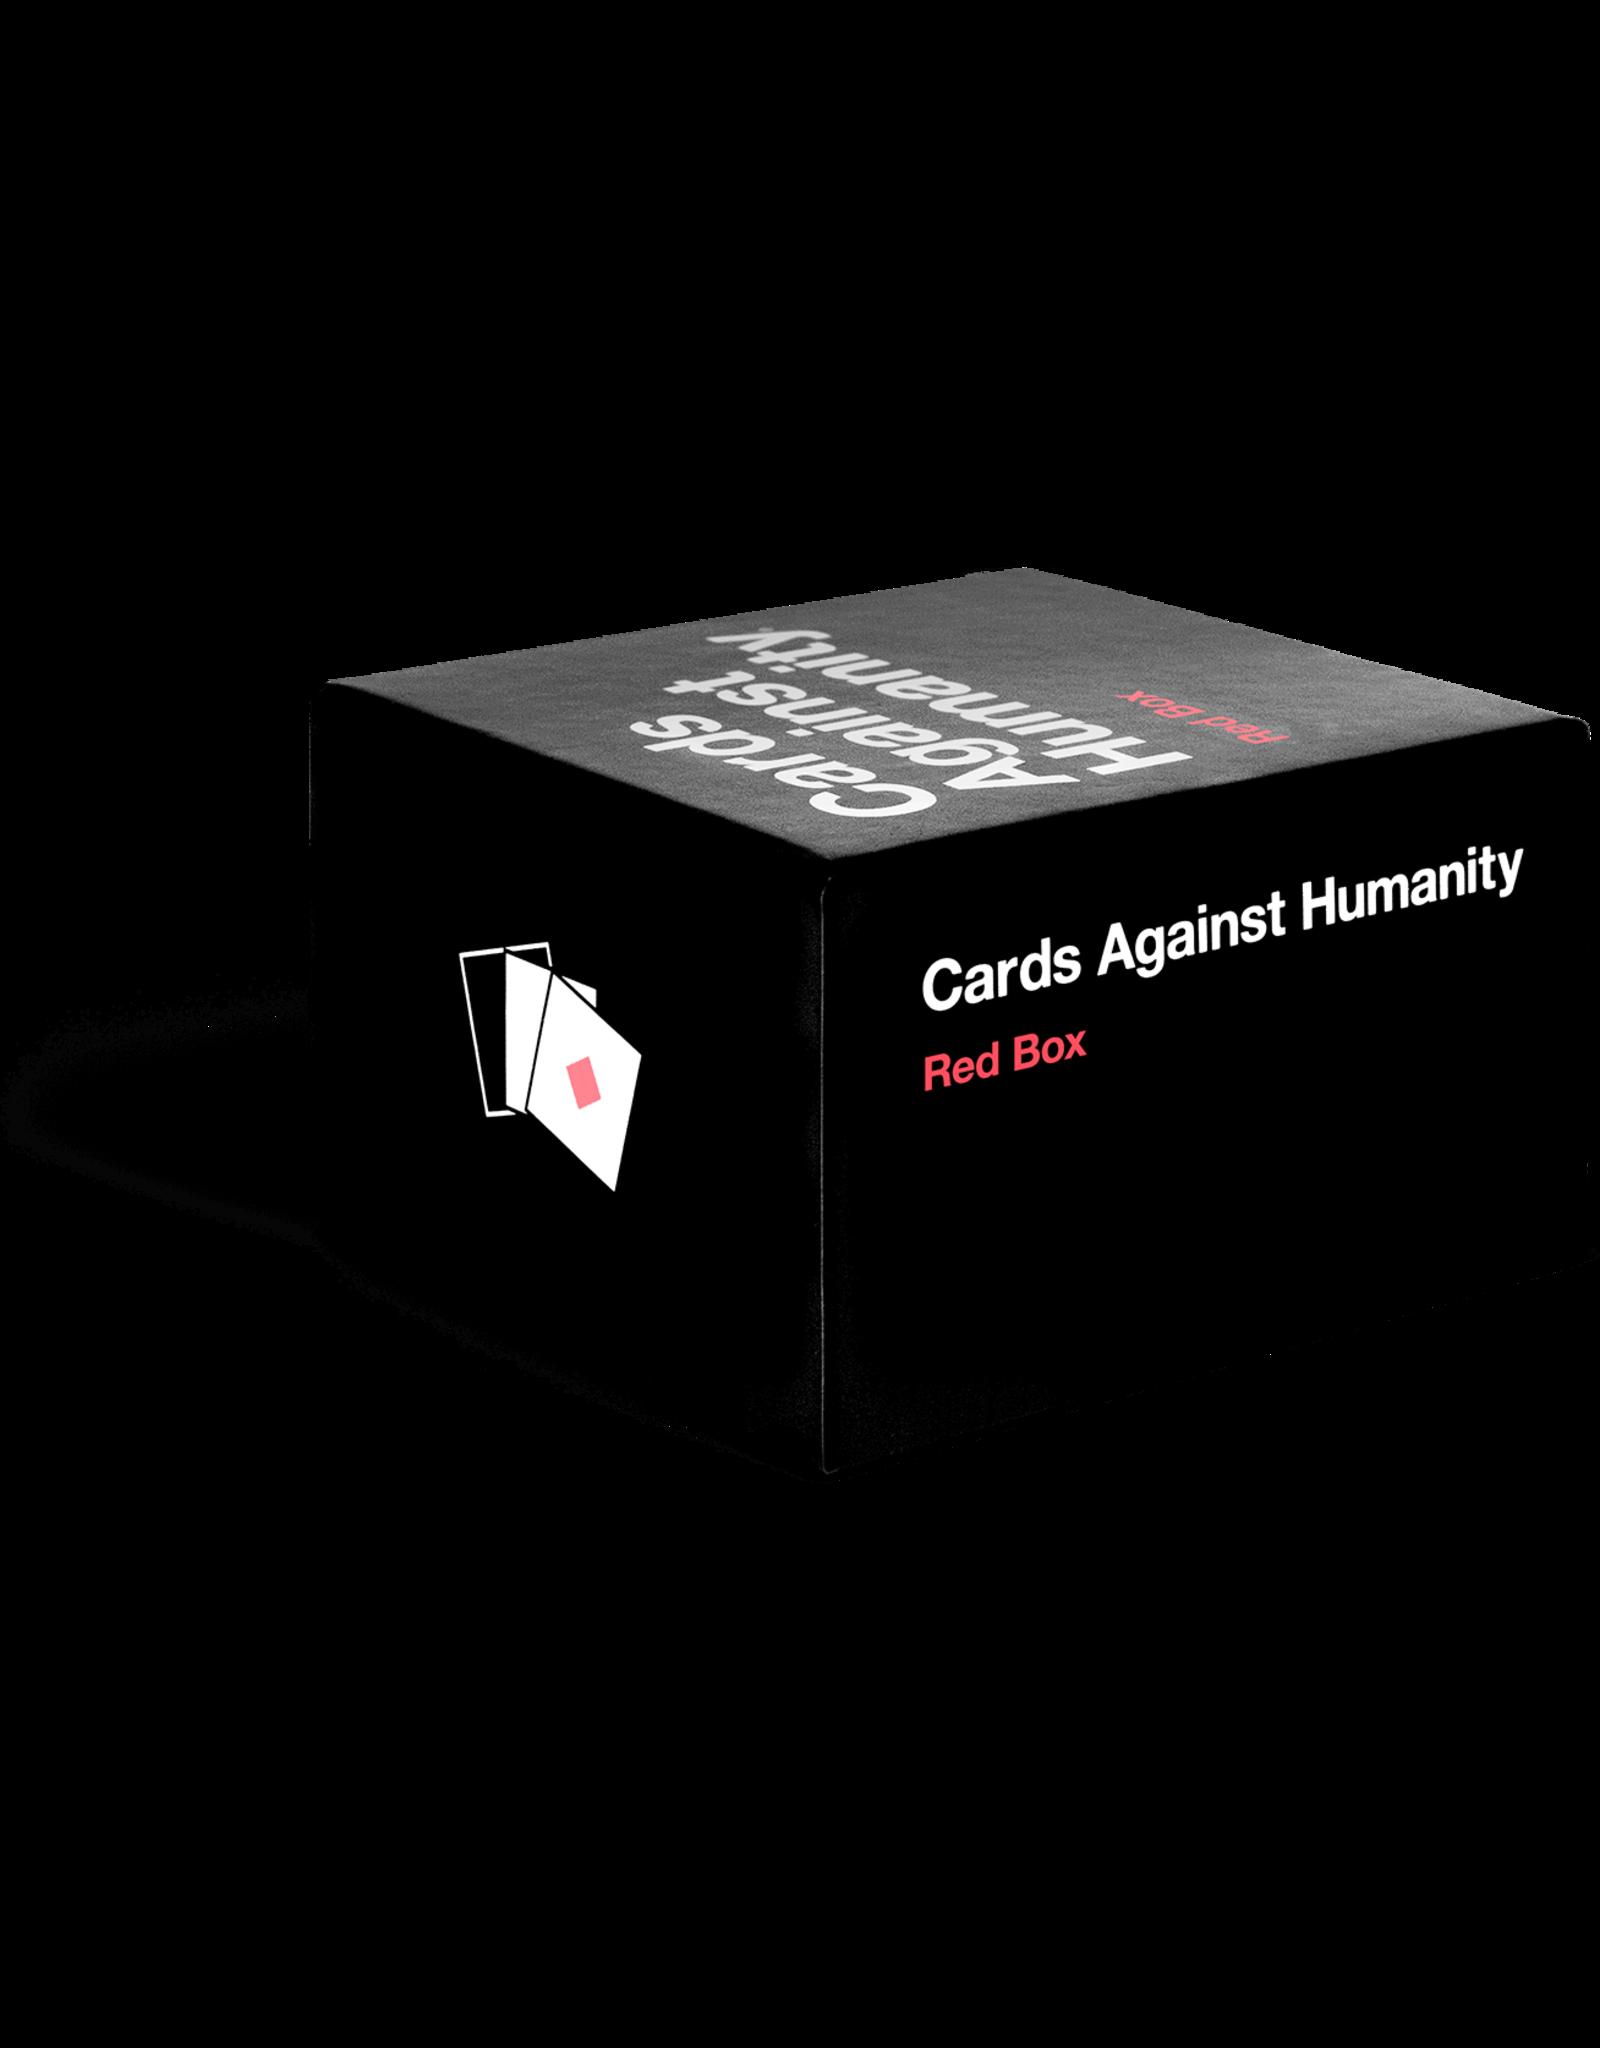 Cards Against Humanity Cards Against Humanity Red Box